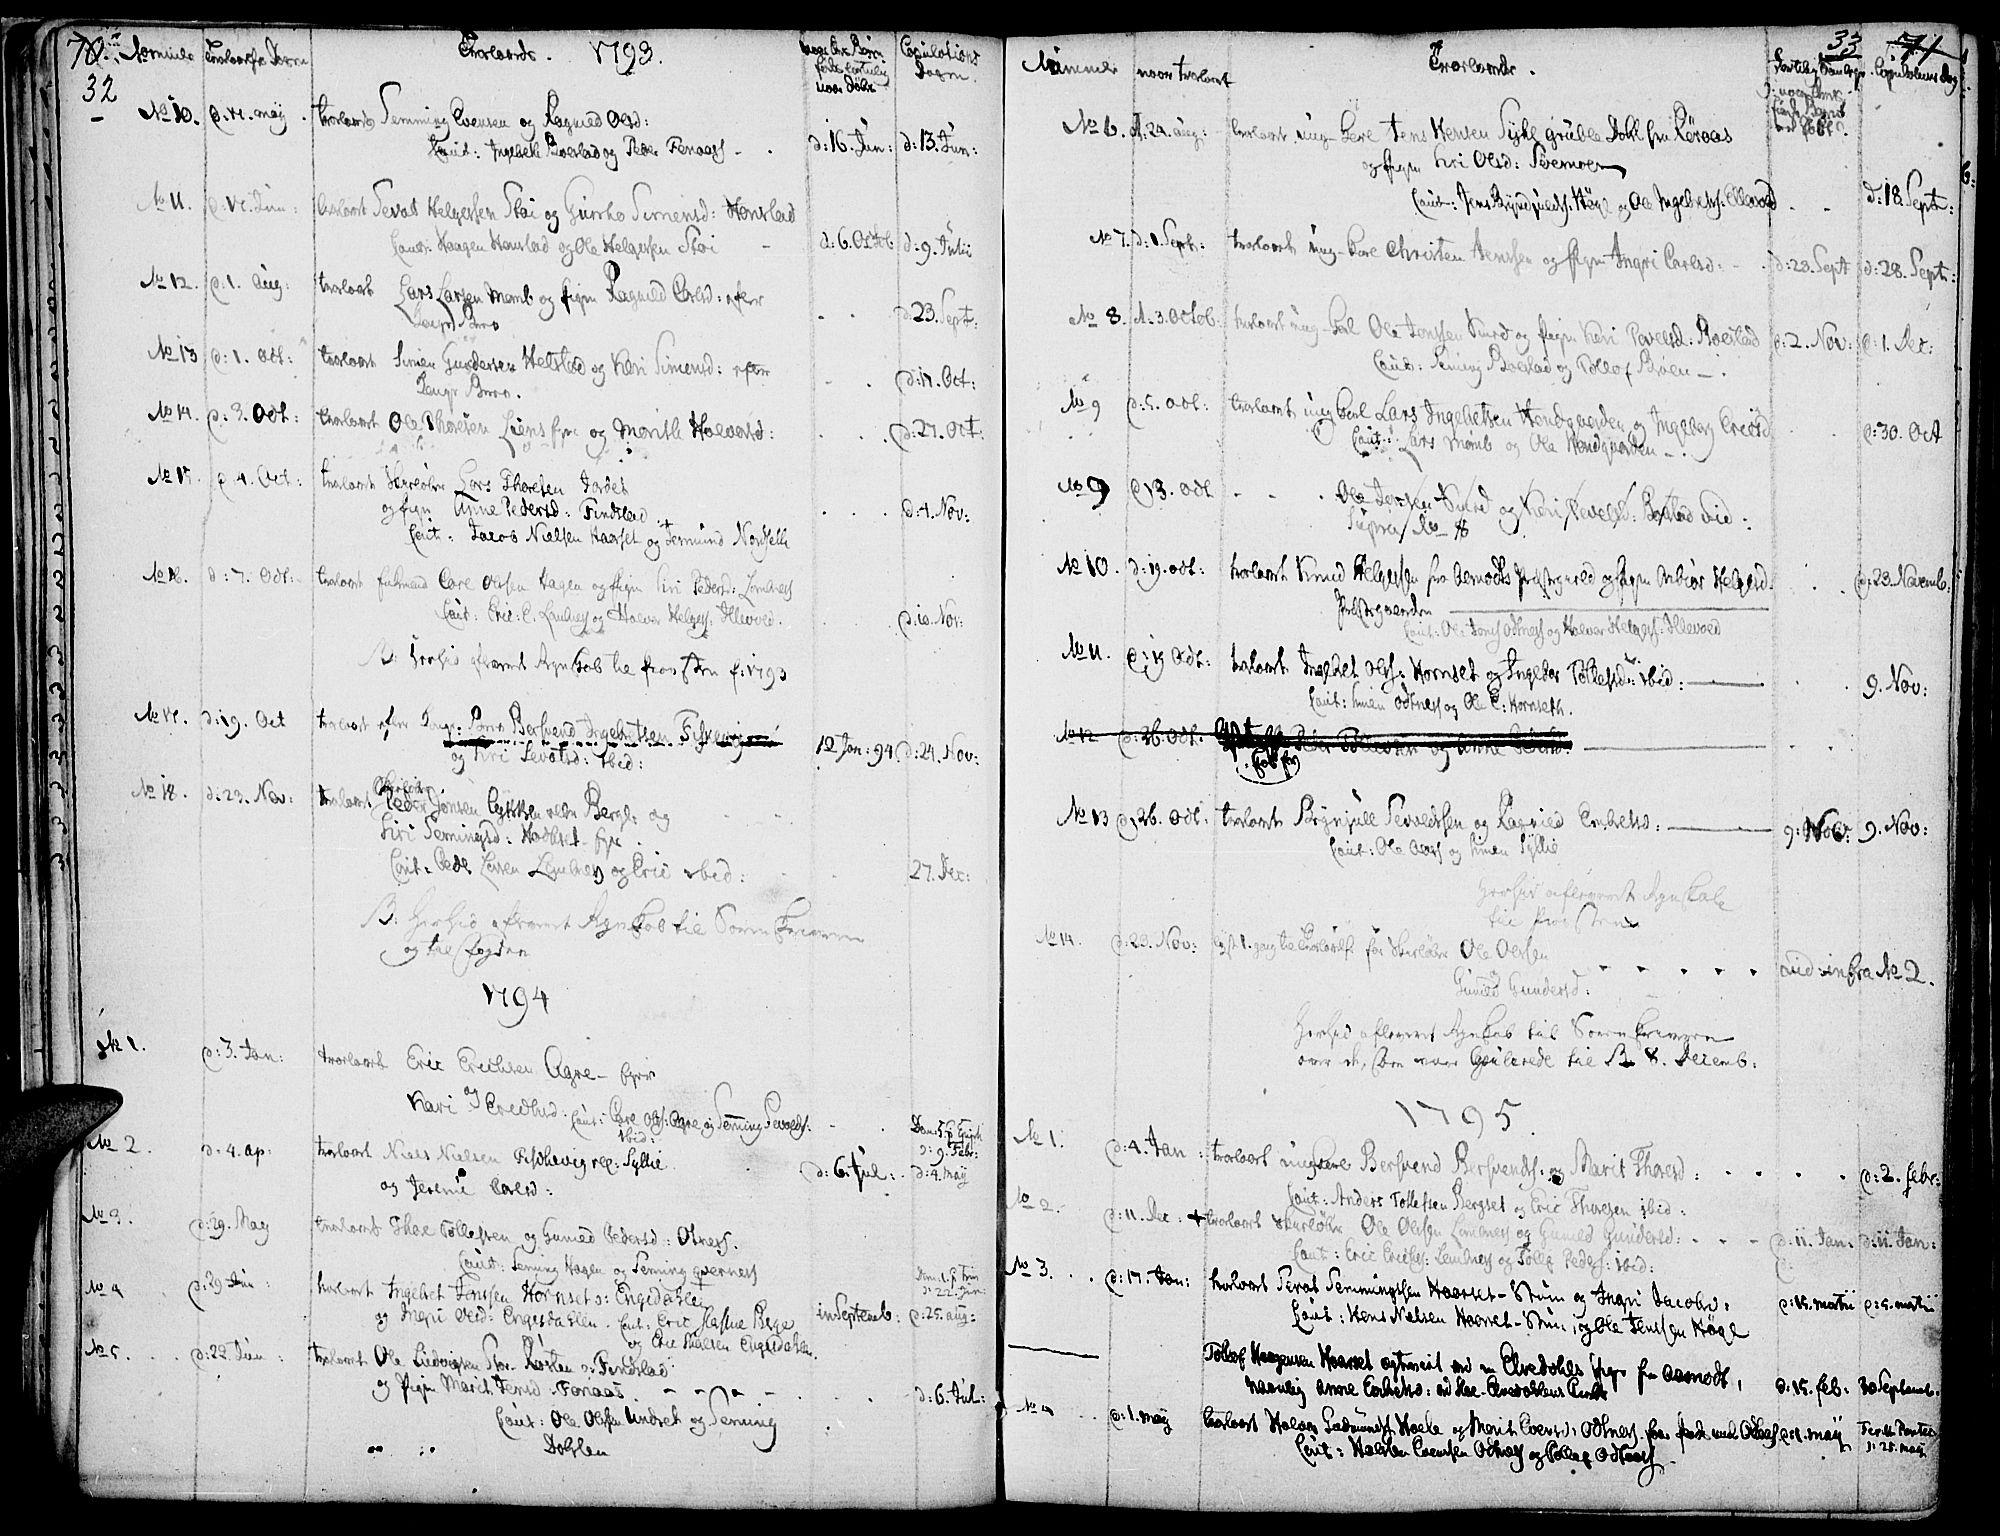 SAH, Rendalen prestekontor, H/Ha/Haa/L0002: Ministerialbok nr. 2, 1788-1814, s. 32-33